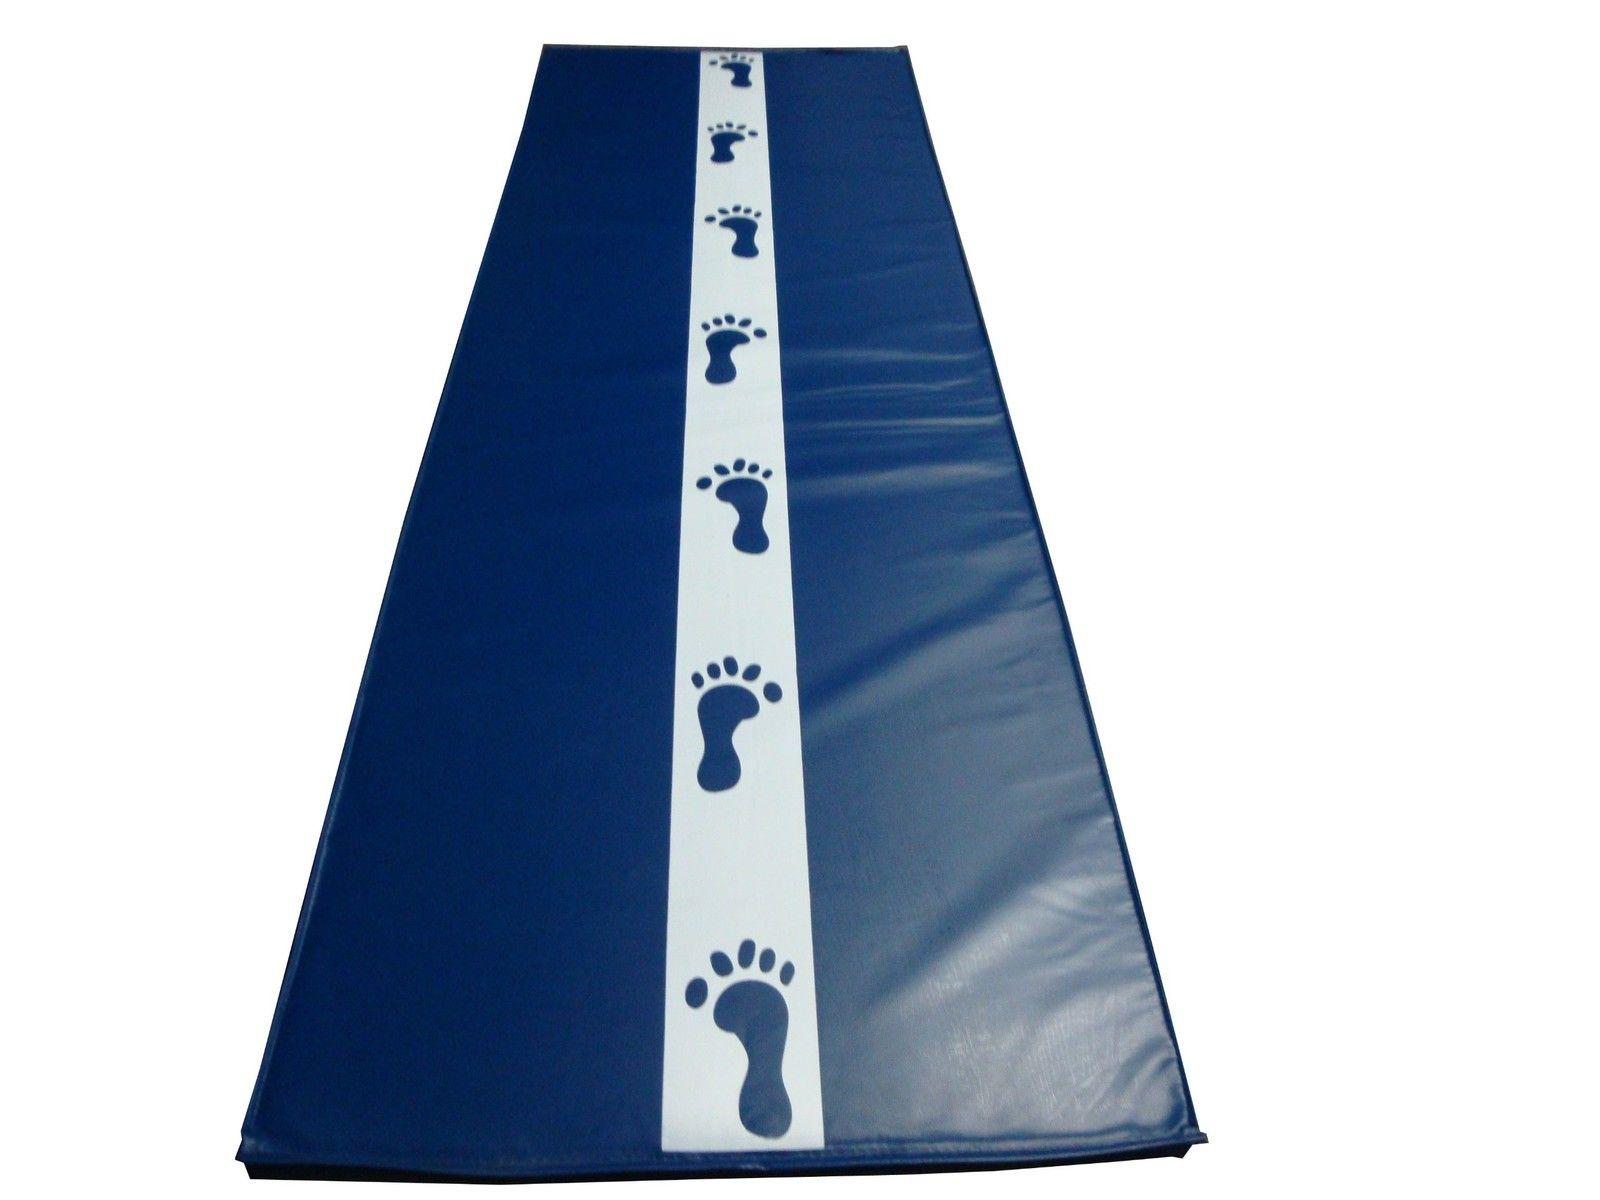 6 39 x2 39 new blue cartwheel mat. Black Bedroom Furniture Sets. Home Design Ideas